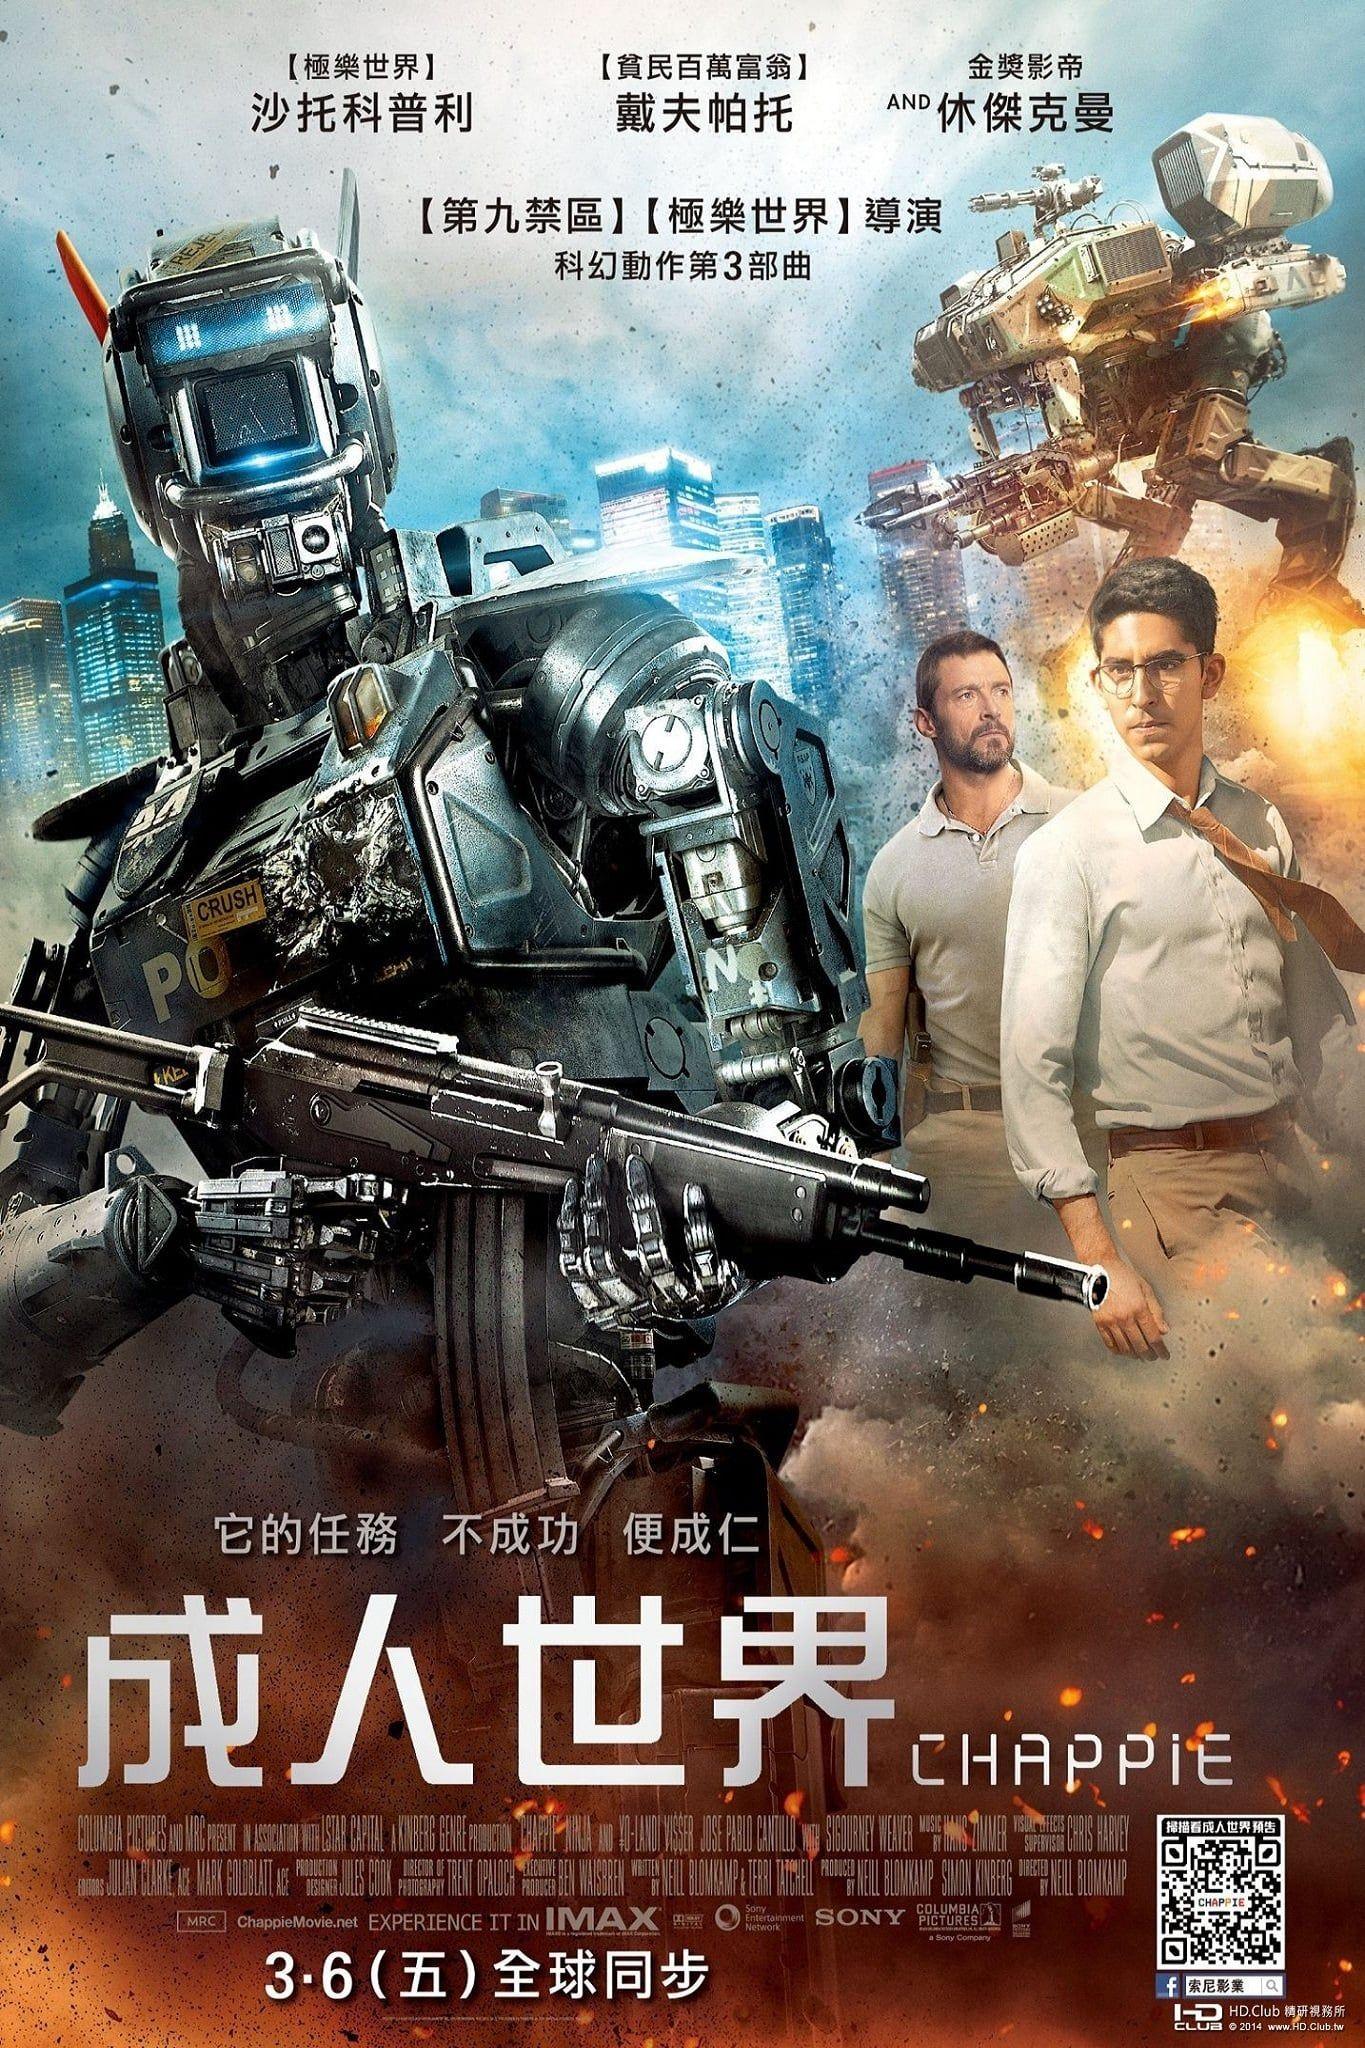 Utorrent Ver Chappie 2015 Pelicula Completa Online En Espanol Latino Free Movies Online Movies Online Full Movies